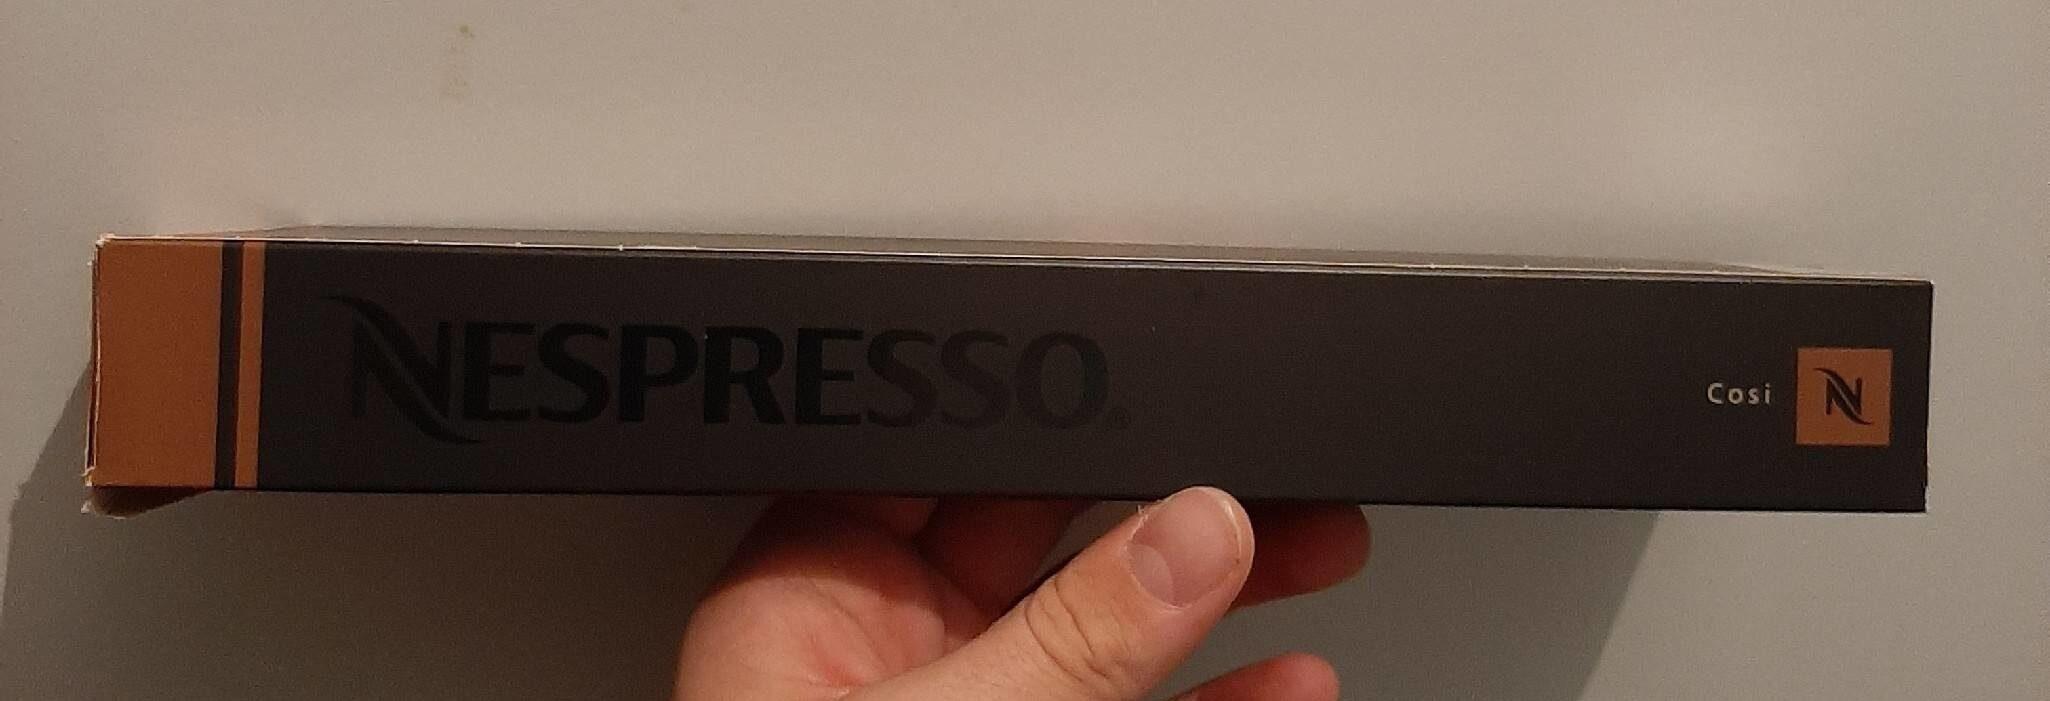 Dosettes Nespresso - Informations nutritionnelles